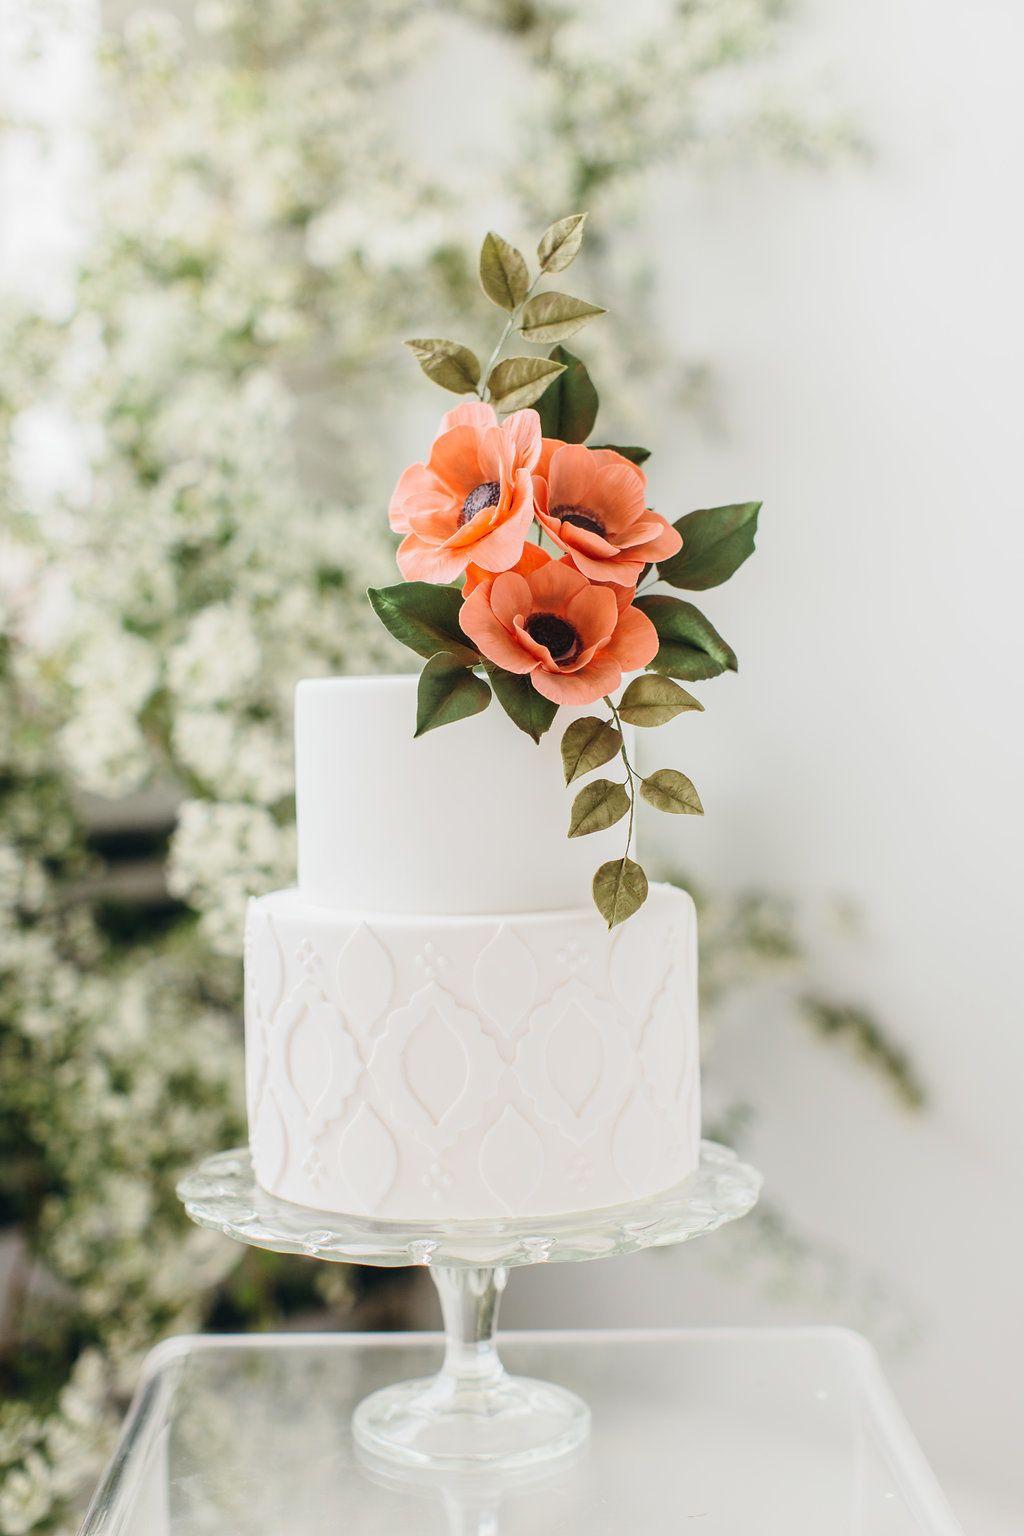 Romantic style inspiration for the modern minimalist bride